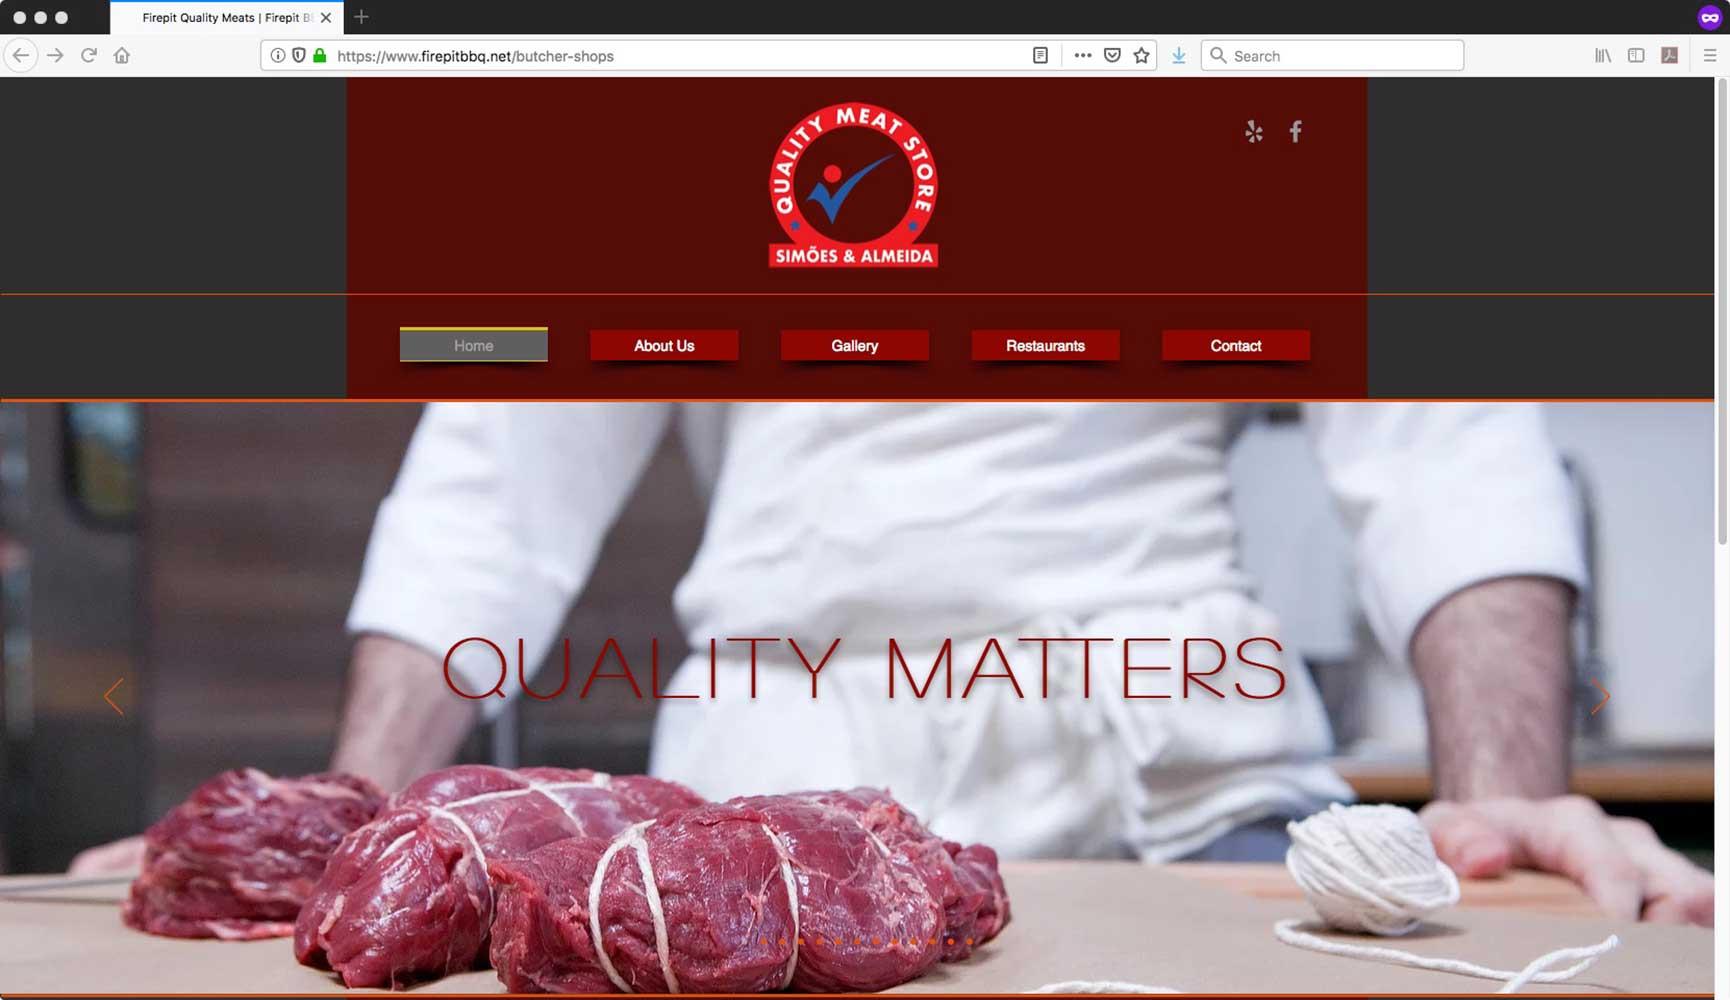 Quality_Meats.jpg